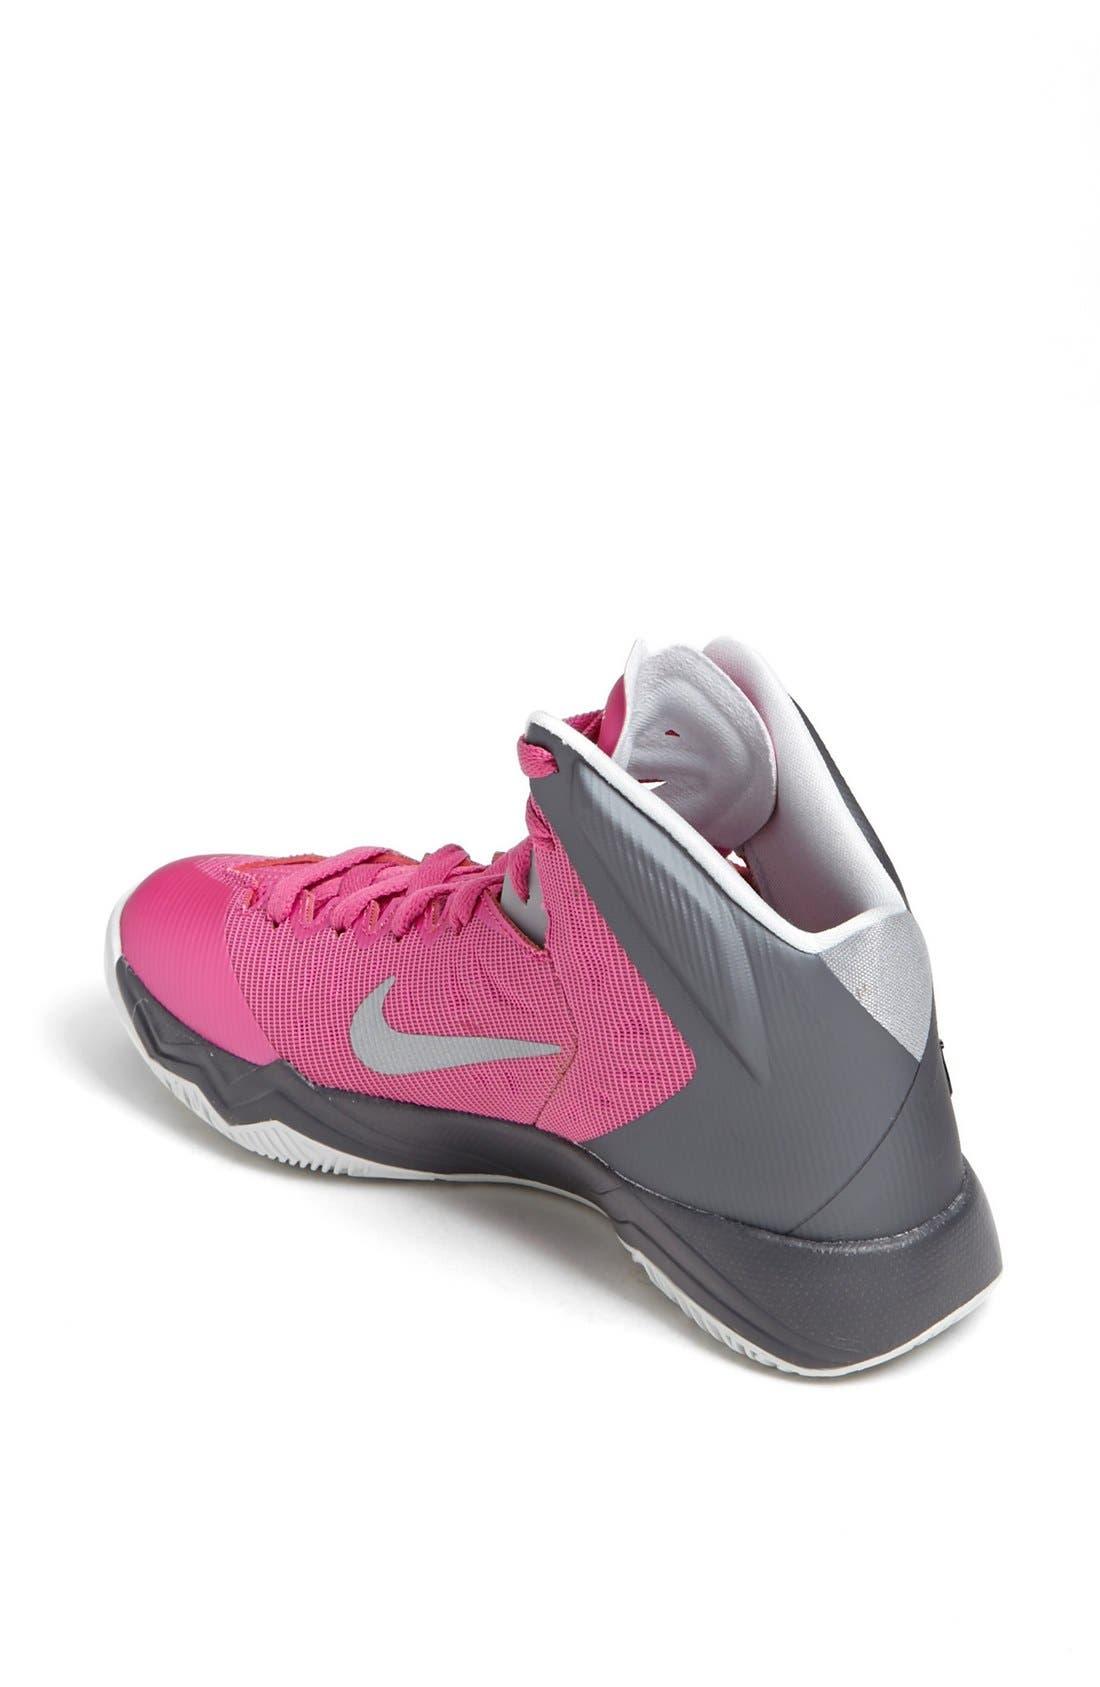 Alternate Image 2  - Nike 'Hyper Quickness' Basketball Shoe (Women)